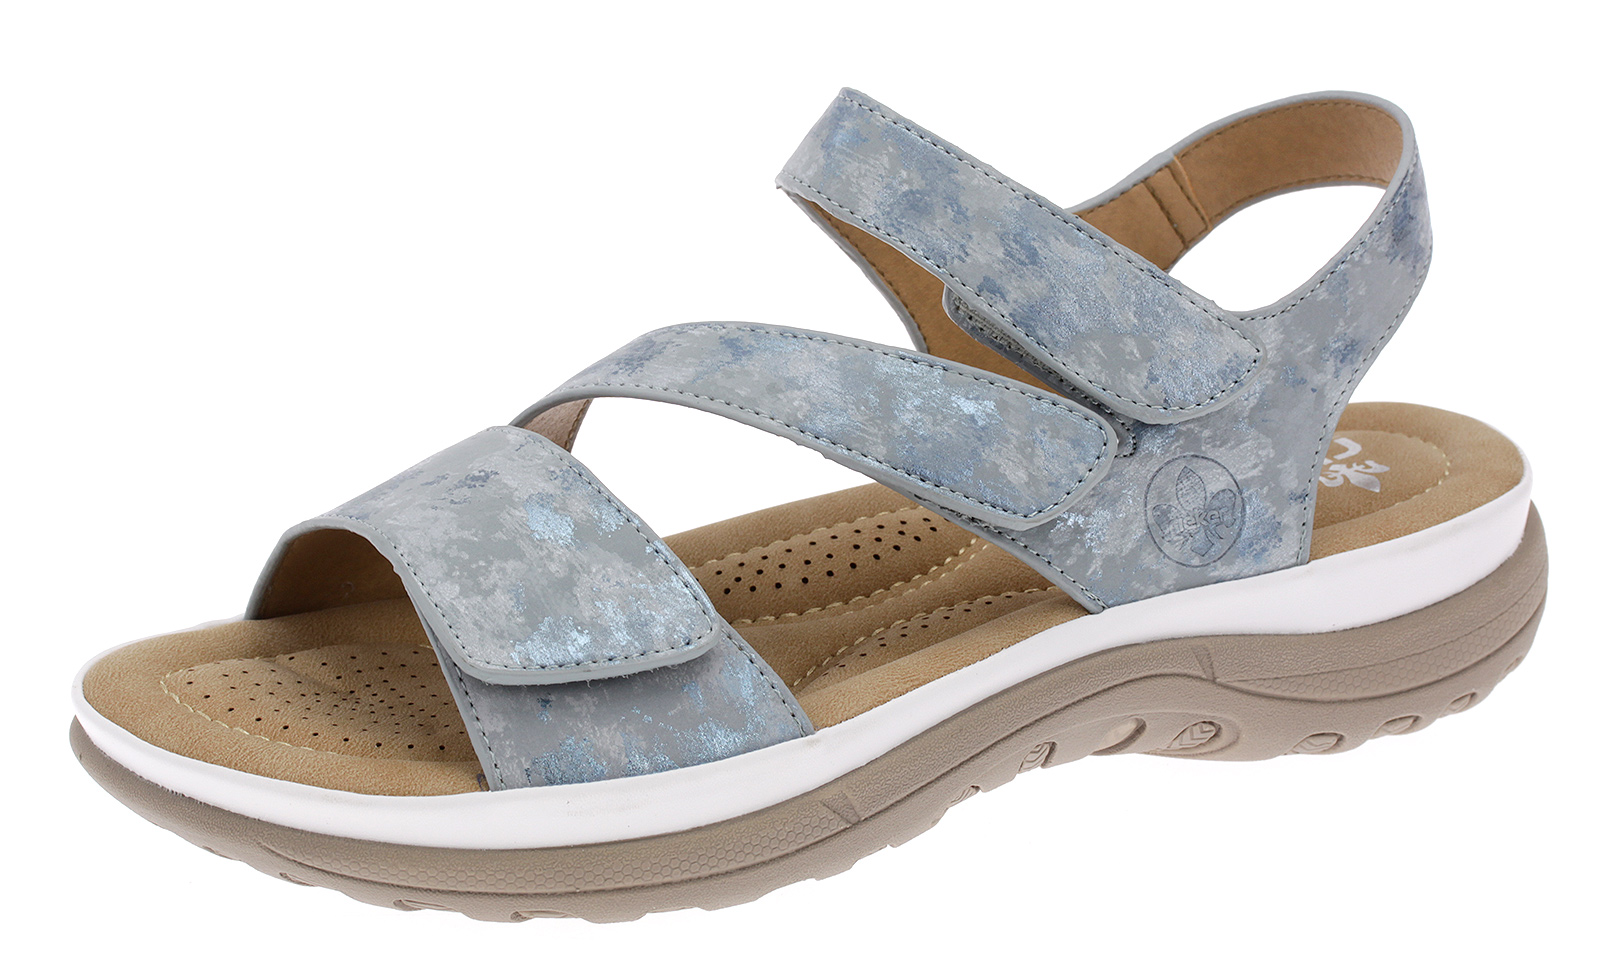 Rieker Sandalette Damen Sandalen Freizeit Sommerschuhe Klettverschluss V8872-12